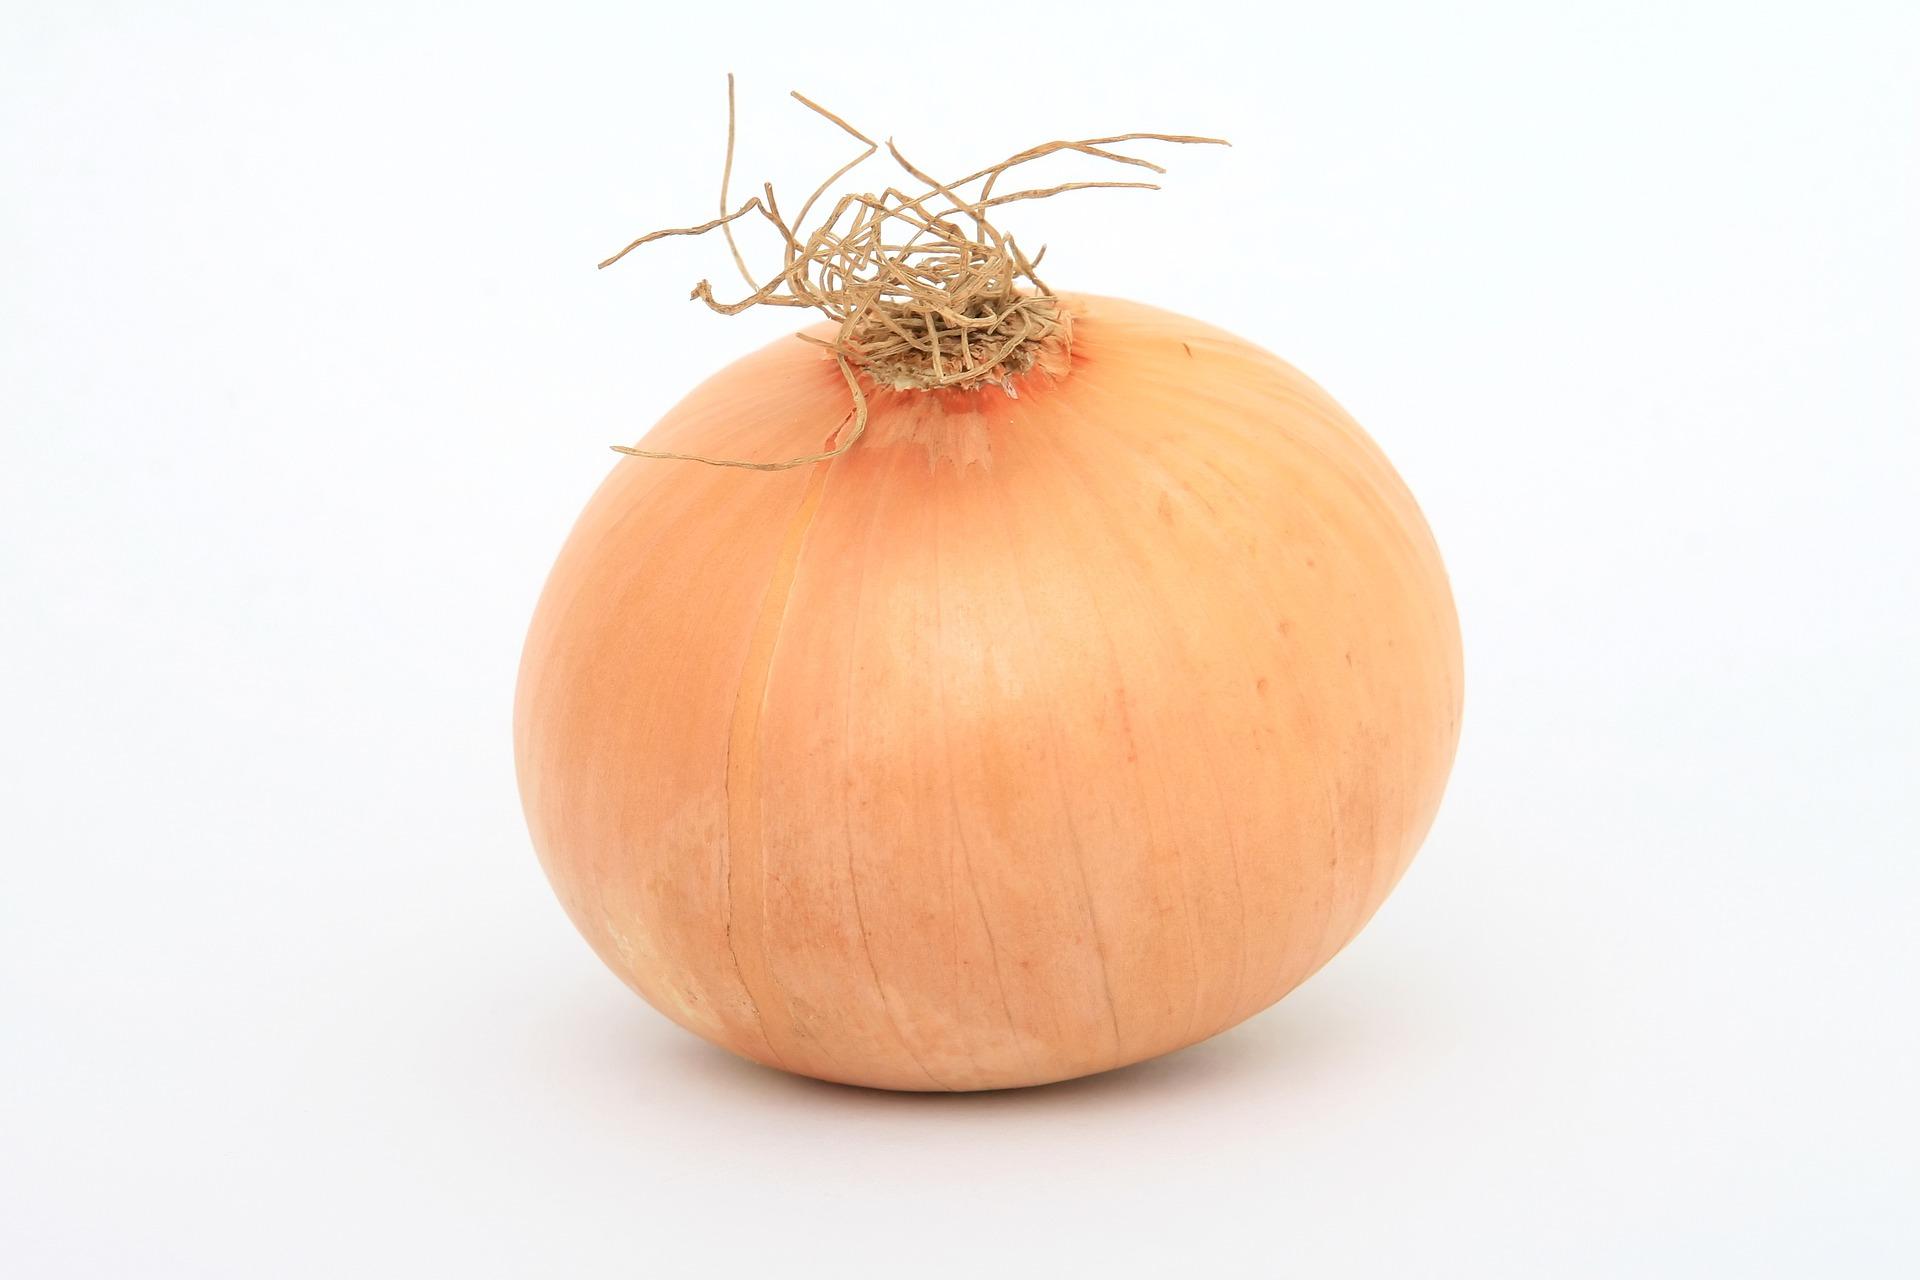 Agri - Onions 1